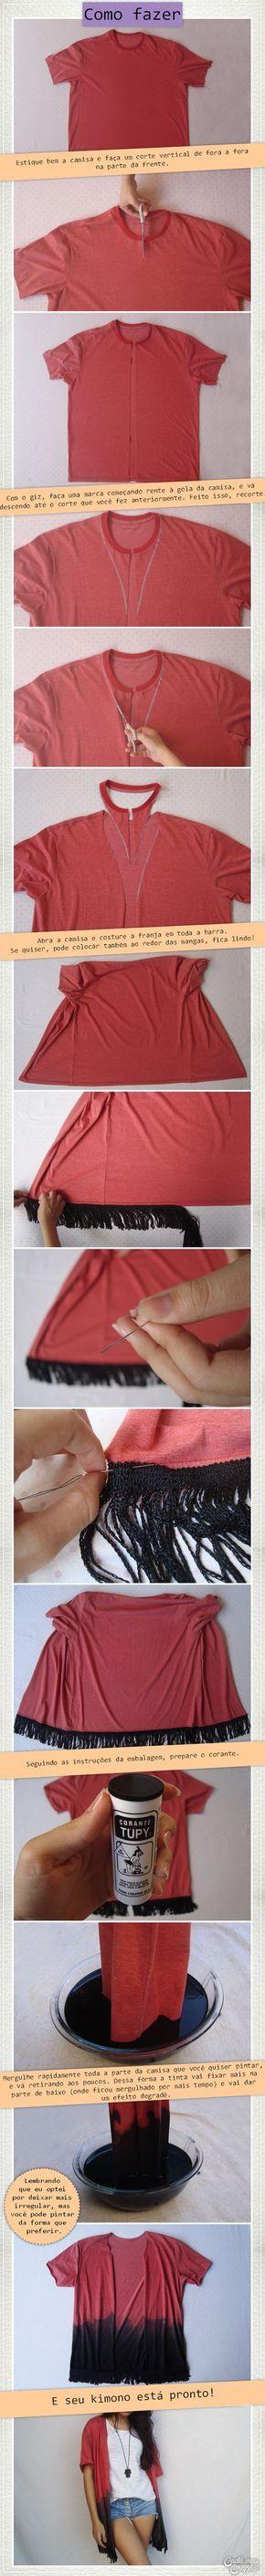 DIY Kimono from t-shirt